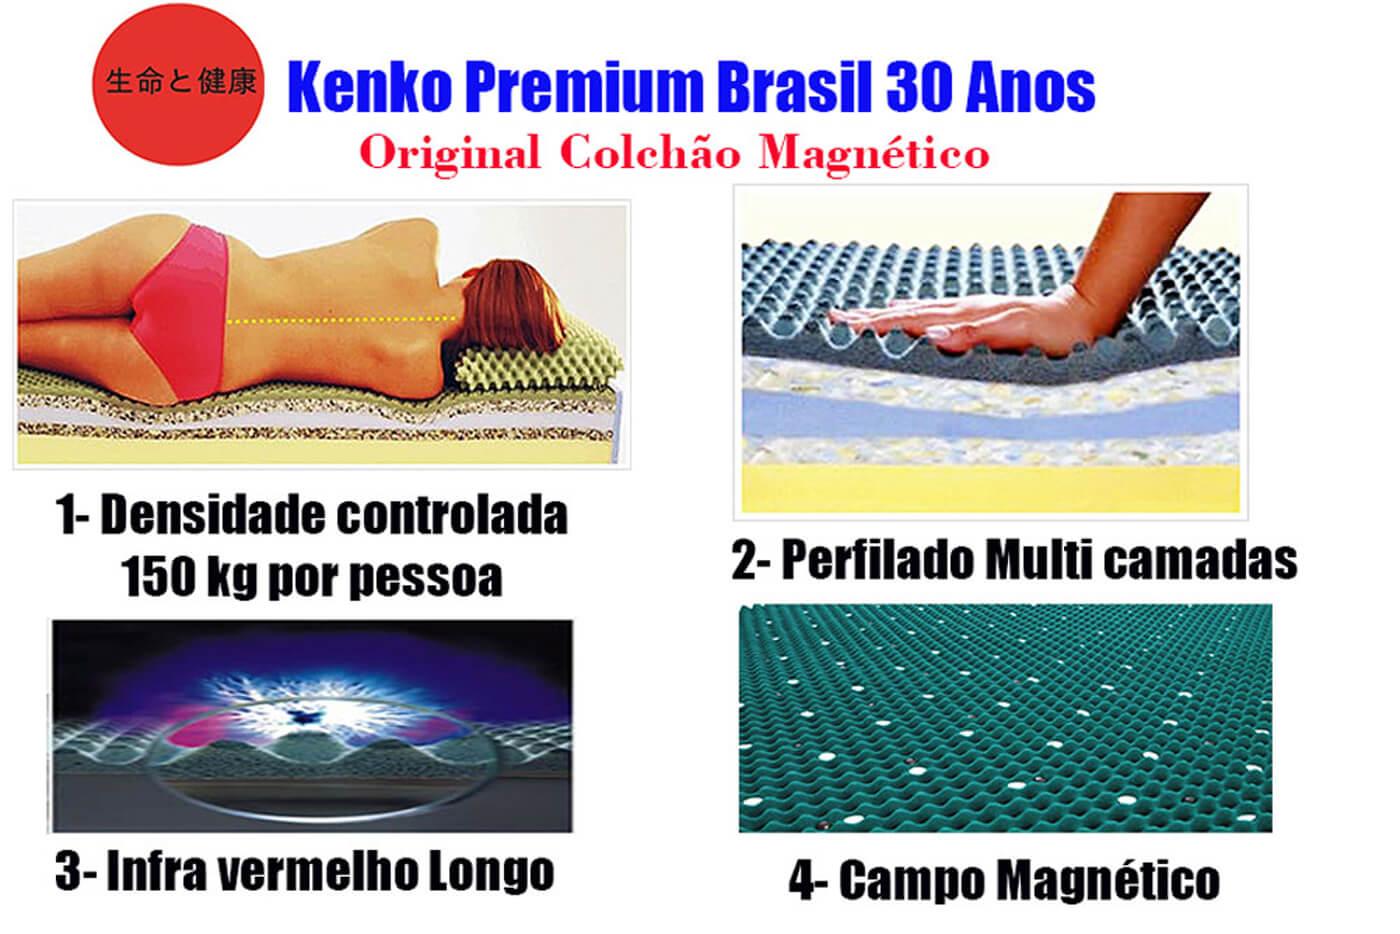 Manta Magnética Colchonete Kenko Premium 10cm Altura  - Kenko Premium Colchões